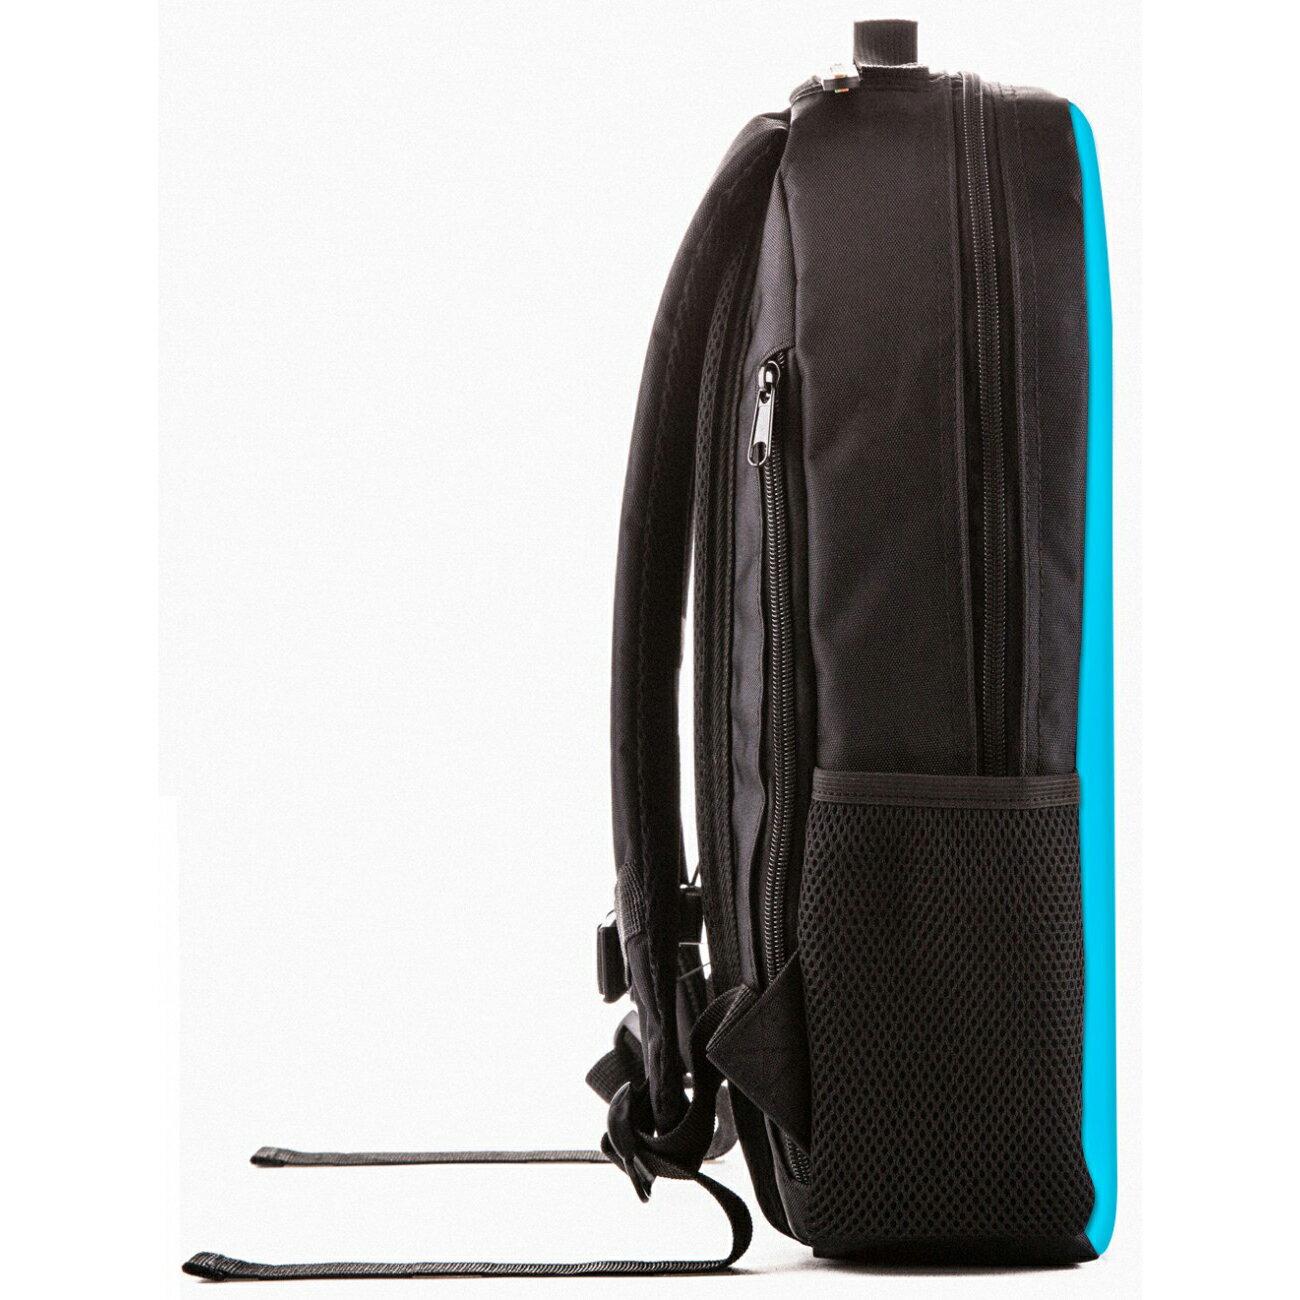 Urban Junk Bluey Student Backpack 1